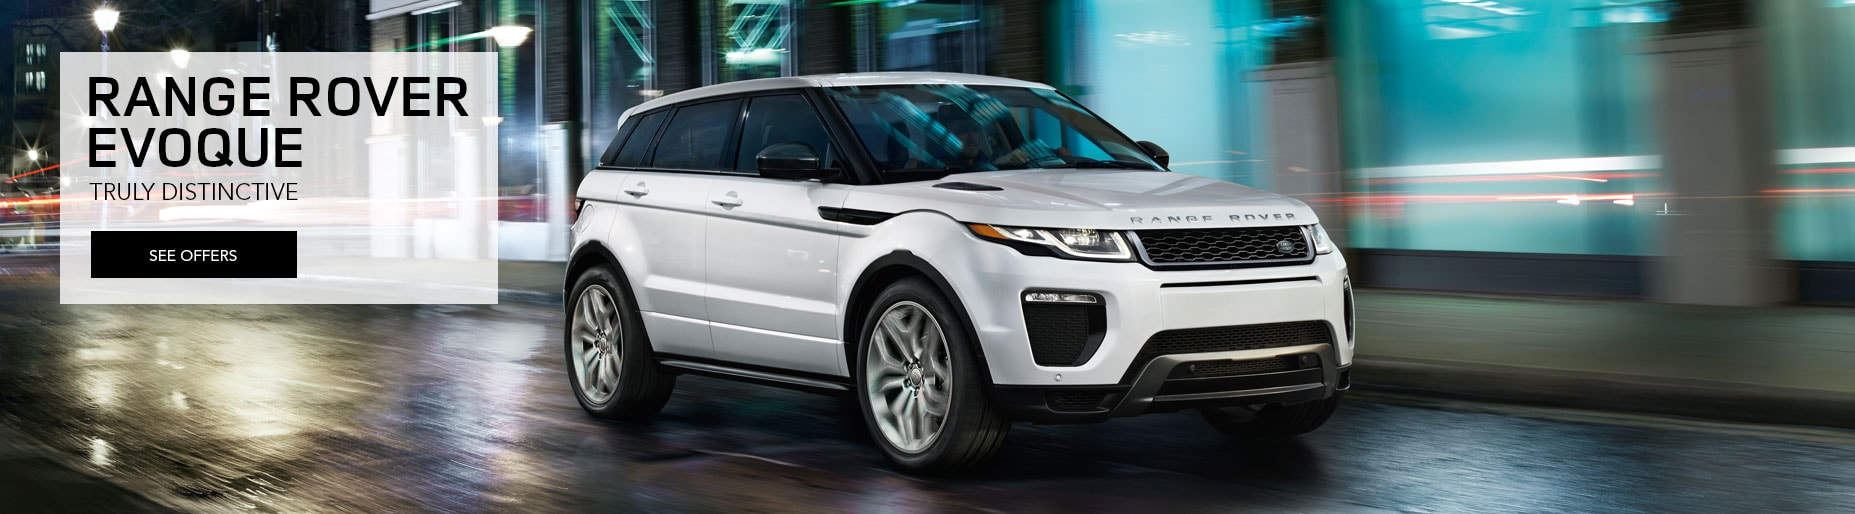 New Land Rover Used Car Dealer In Frisco Tx Land Rover Frisco